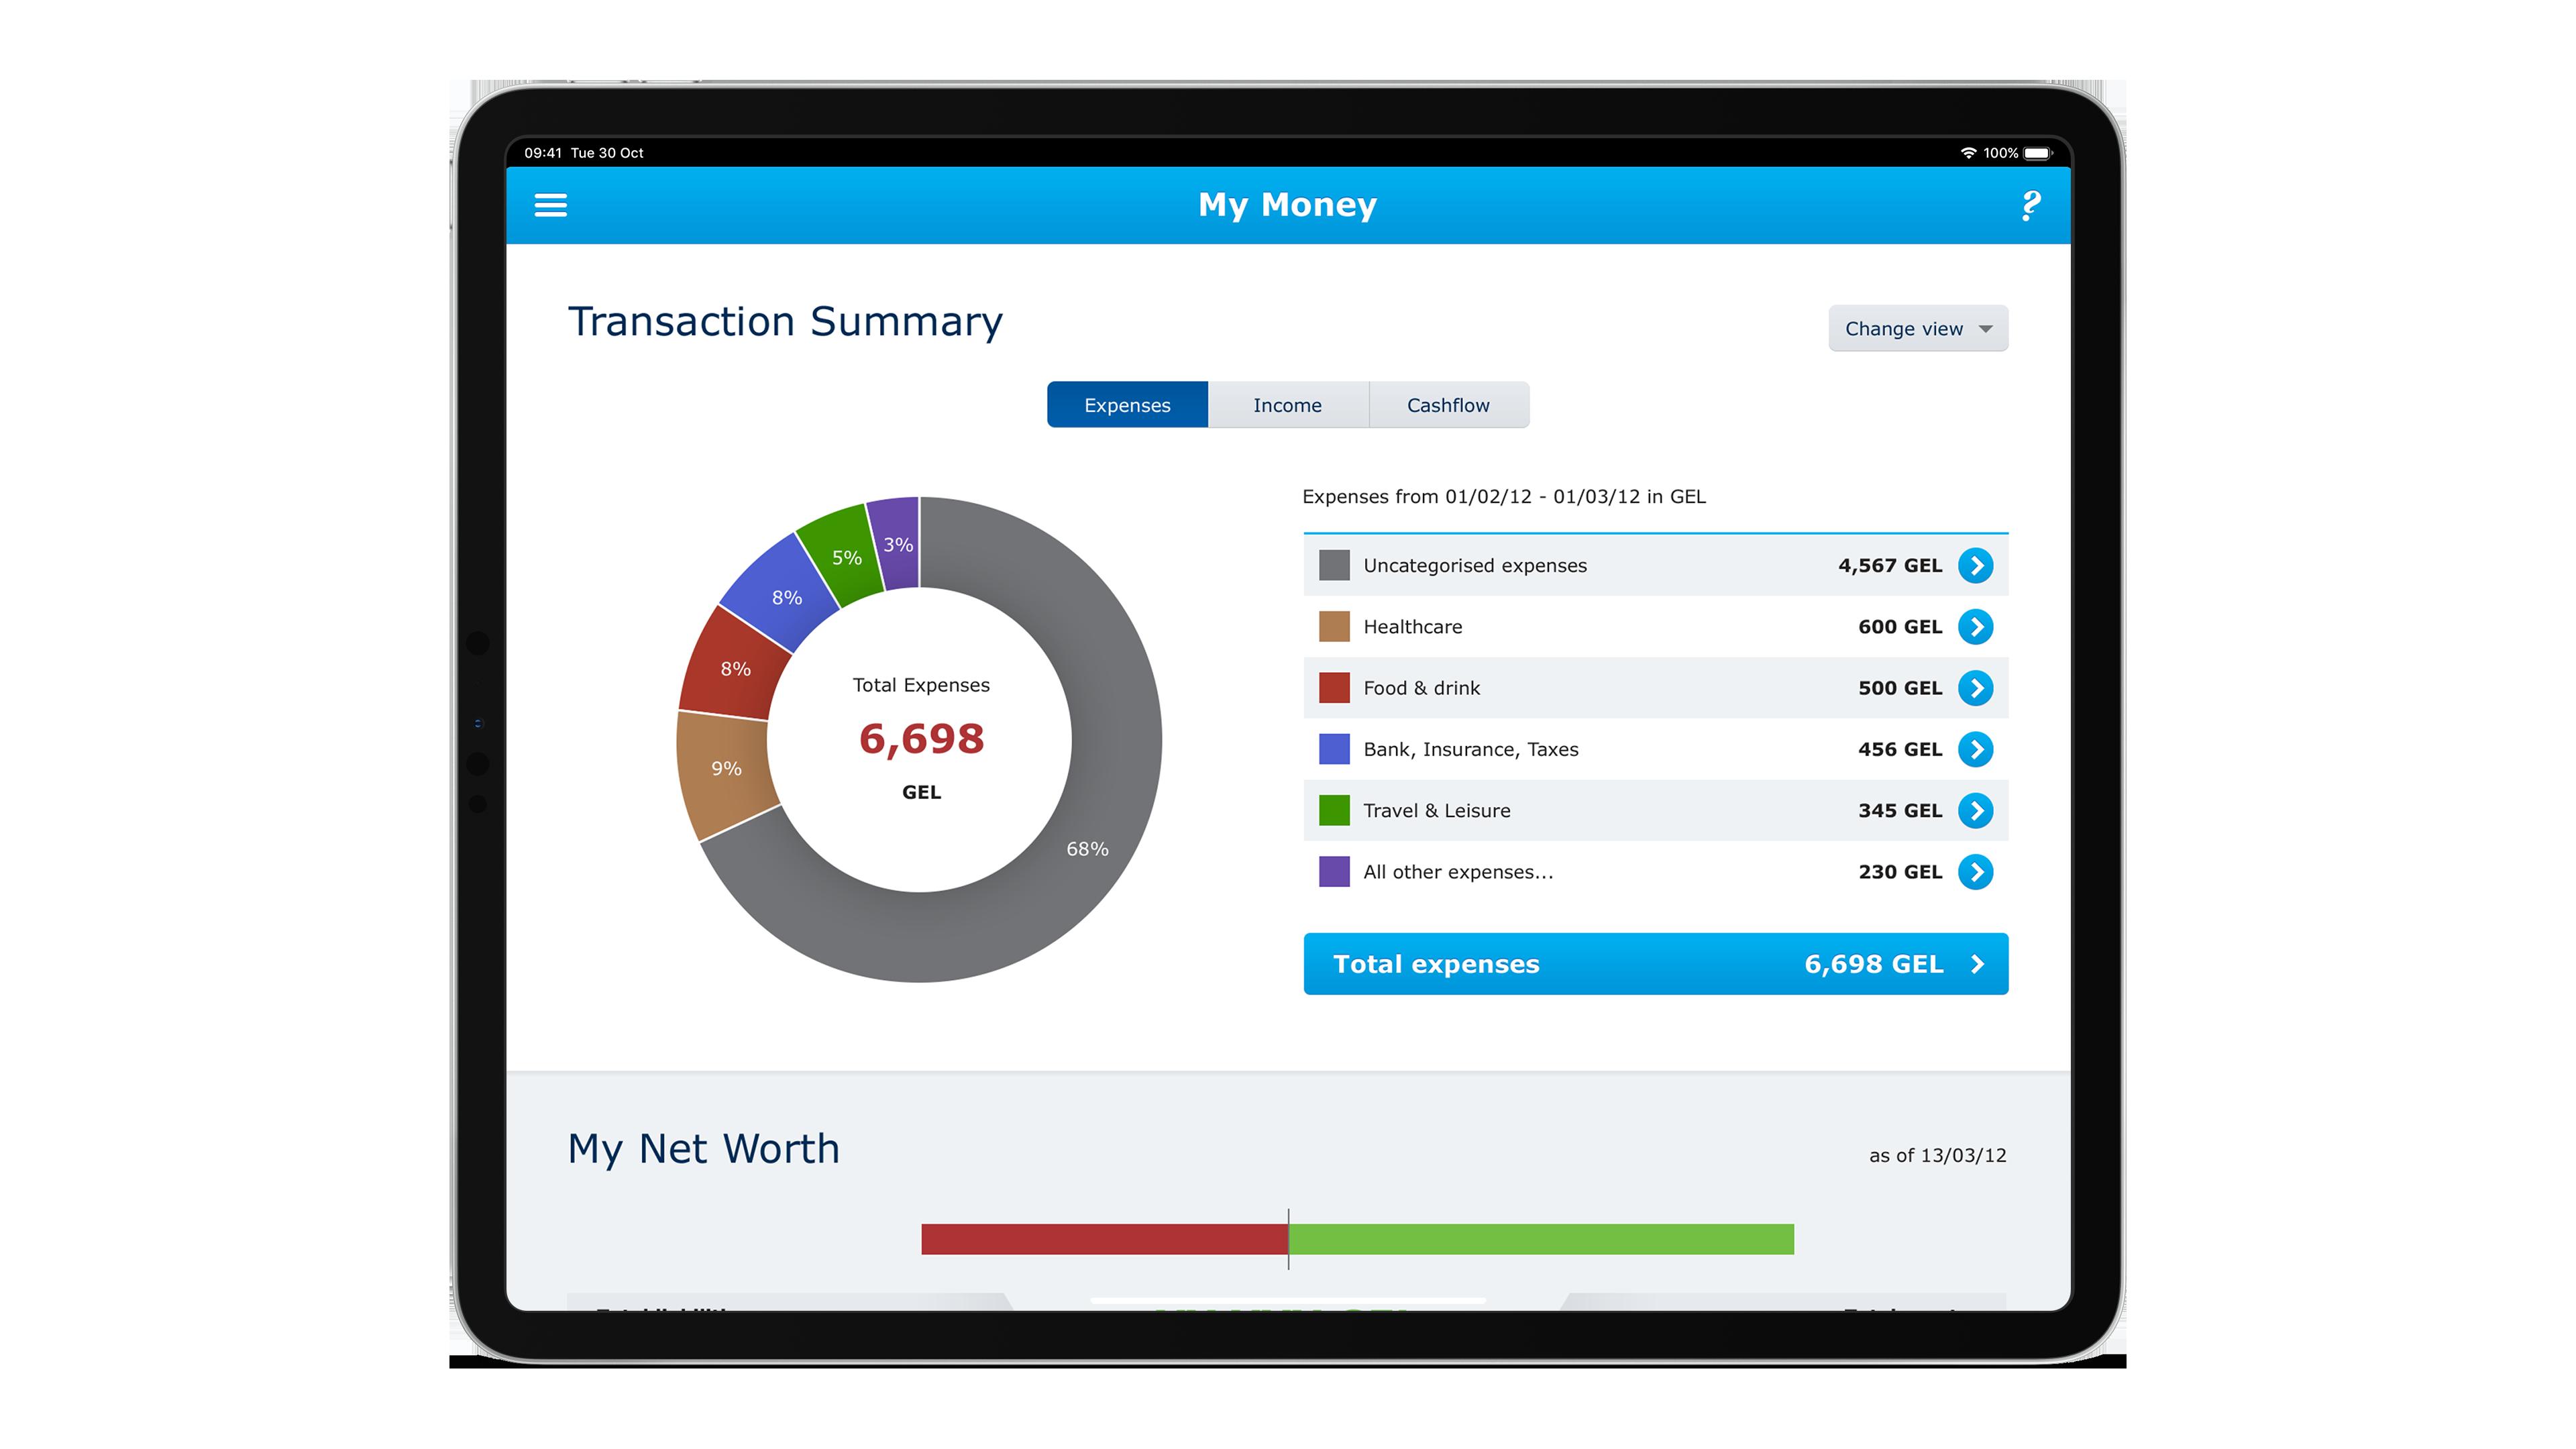 Ipad view of TBC transaction summary